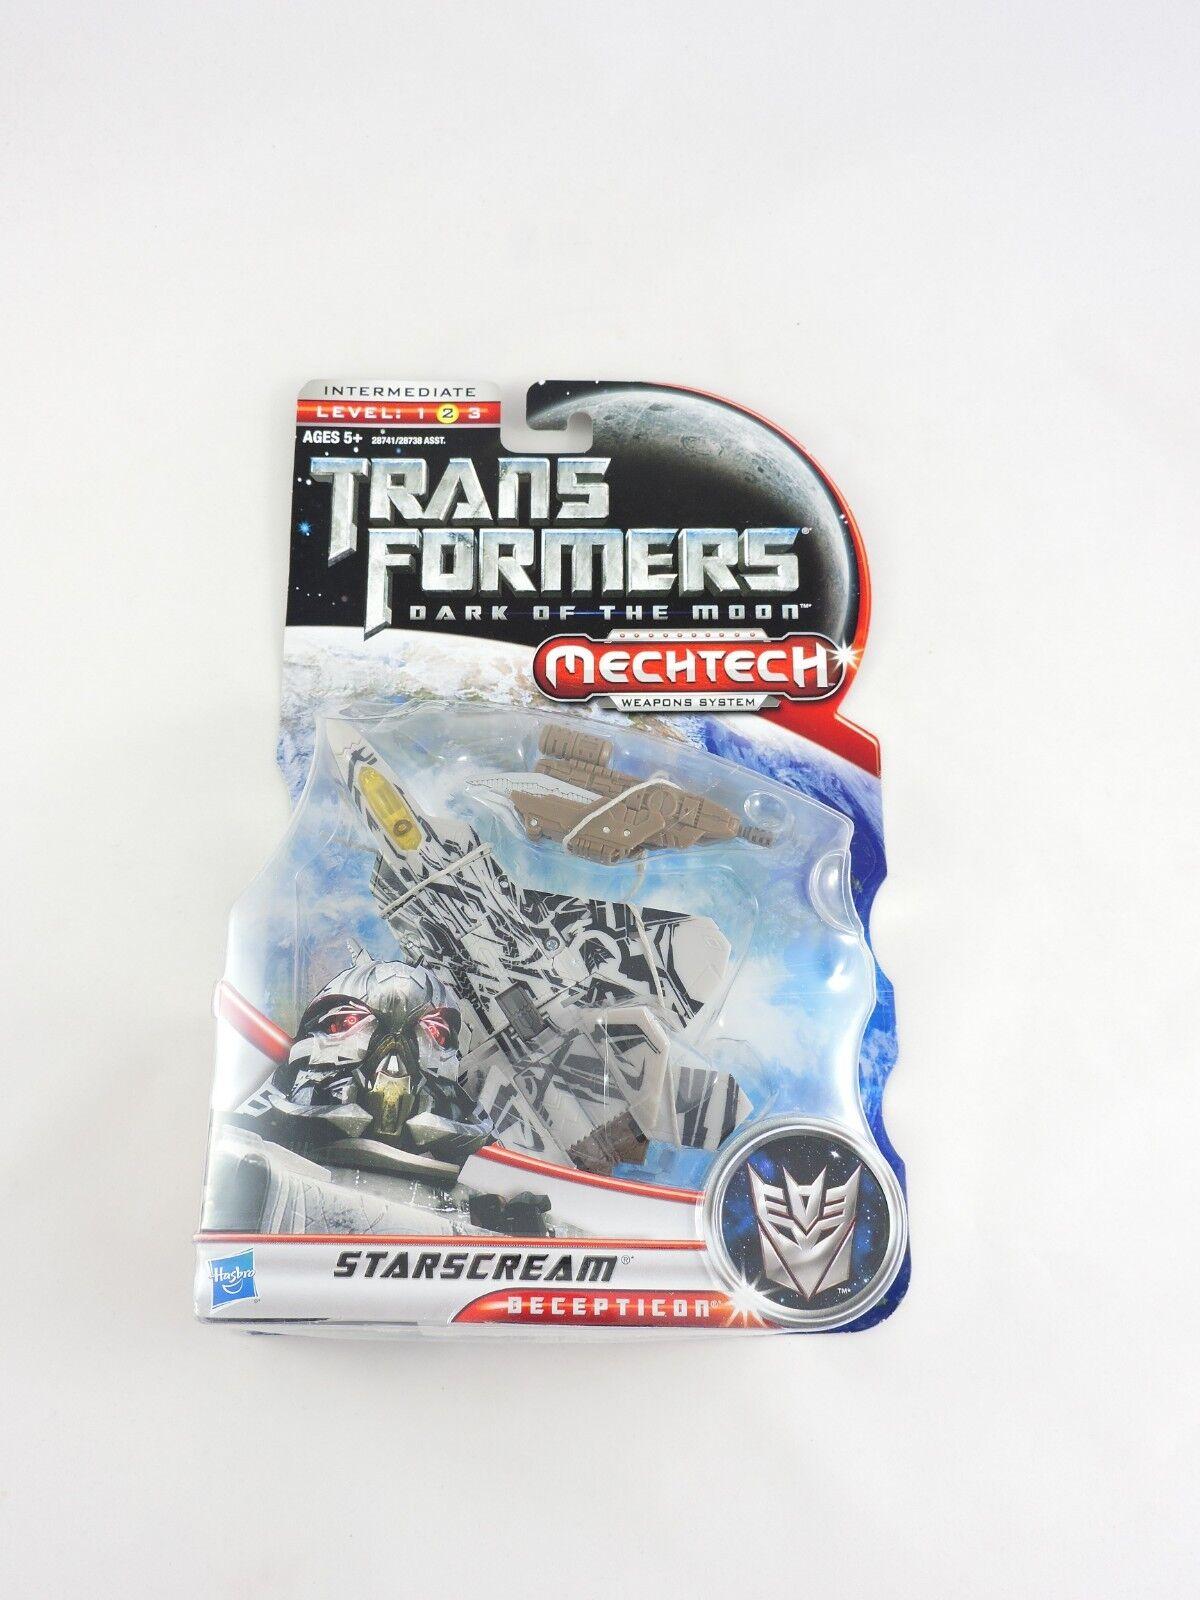 STARSCREAM jet TRANSFORMERS Dark of the Moon 2010 Deluxe Class MOC New DOTM toy